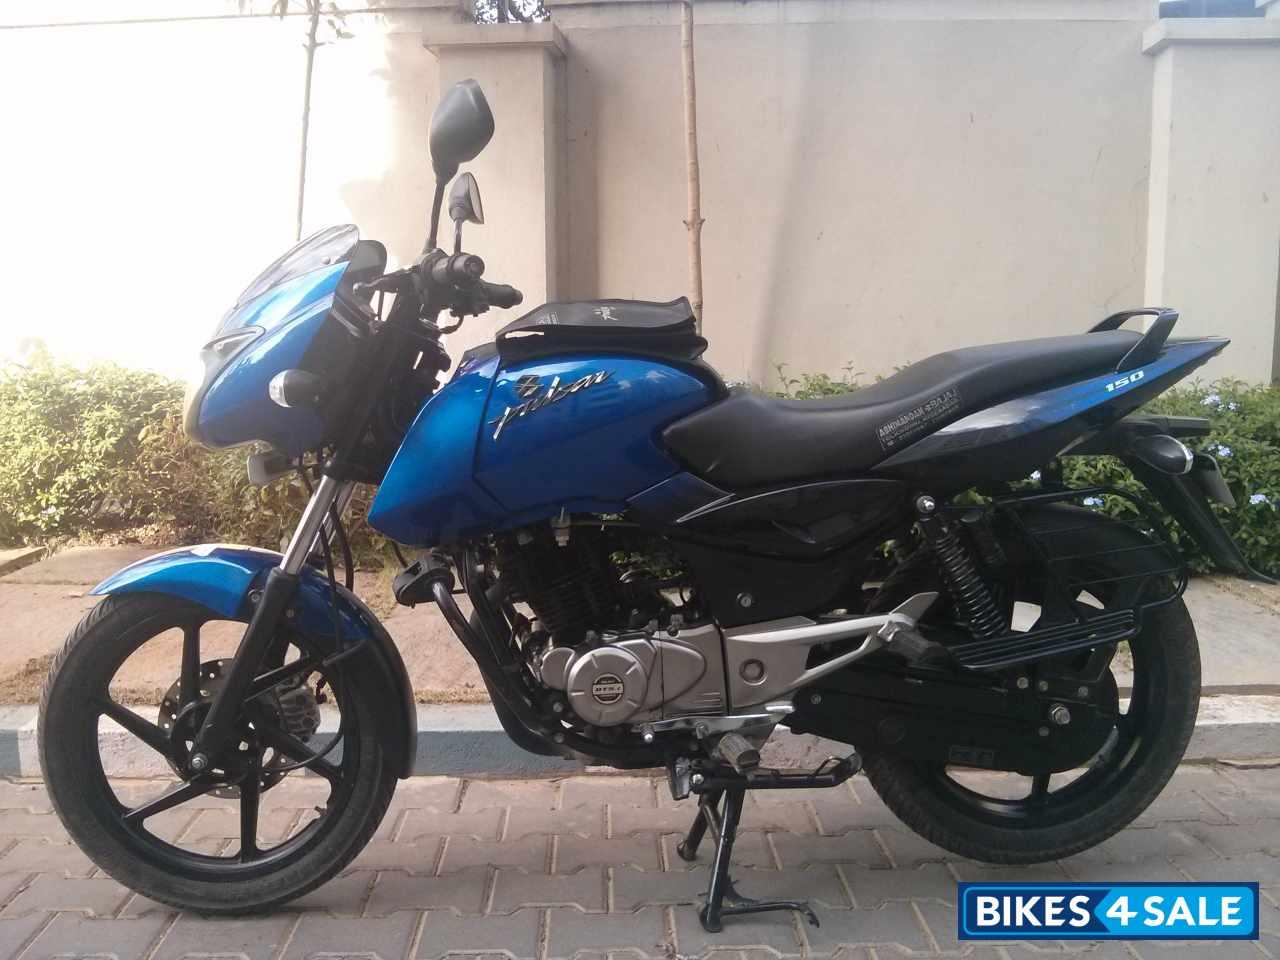 Black & Blue Bajaj Pulsar 150 DTSi Picture 1. Bike ID ...